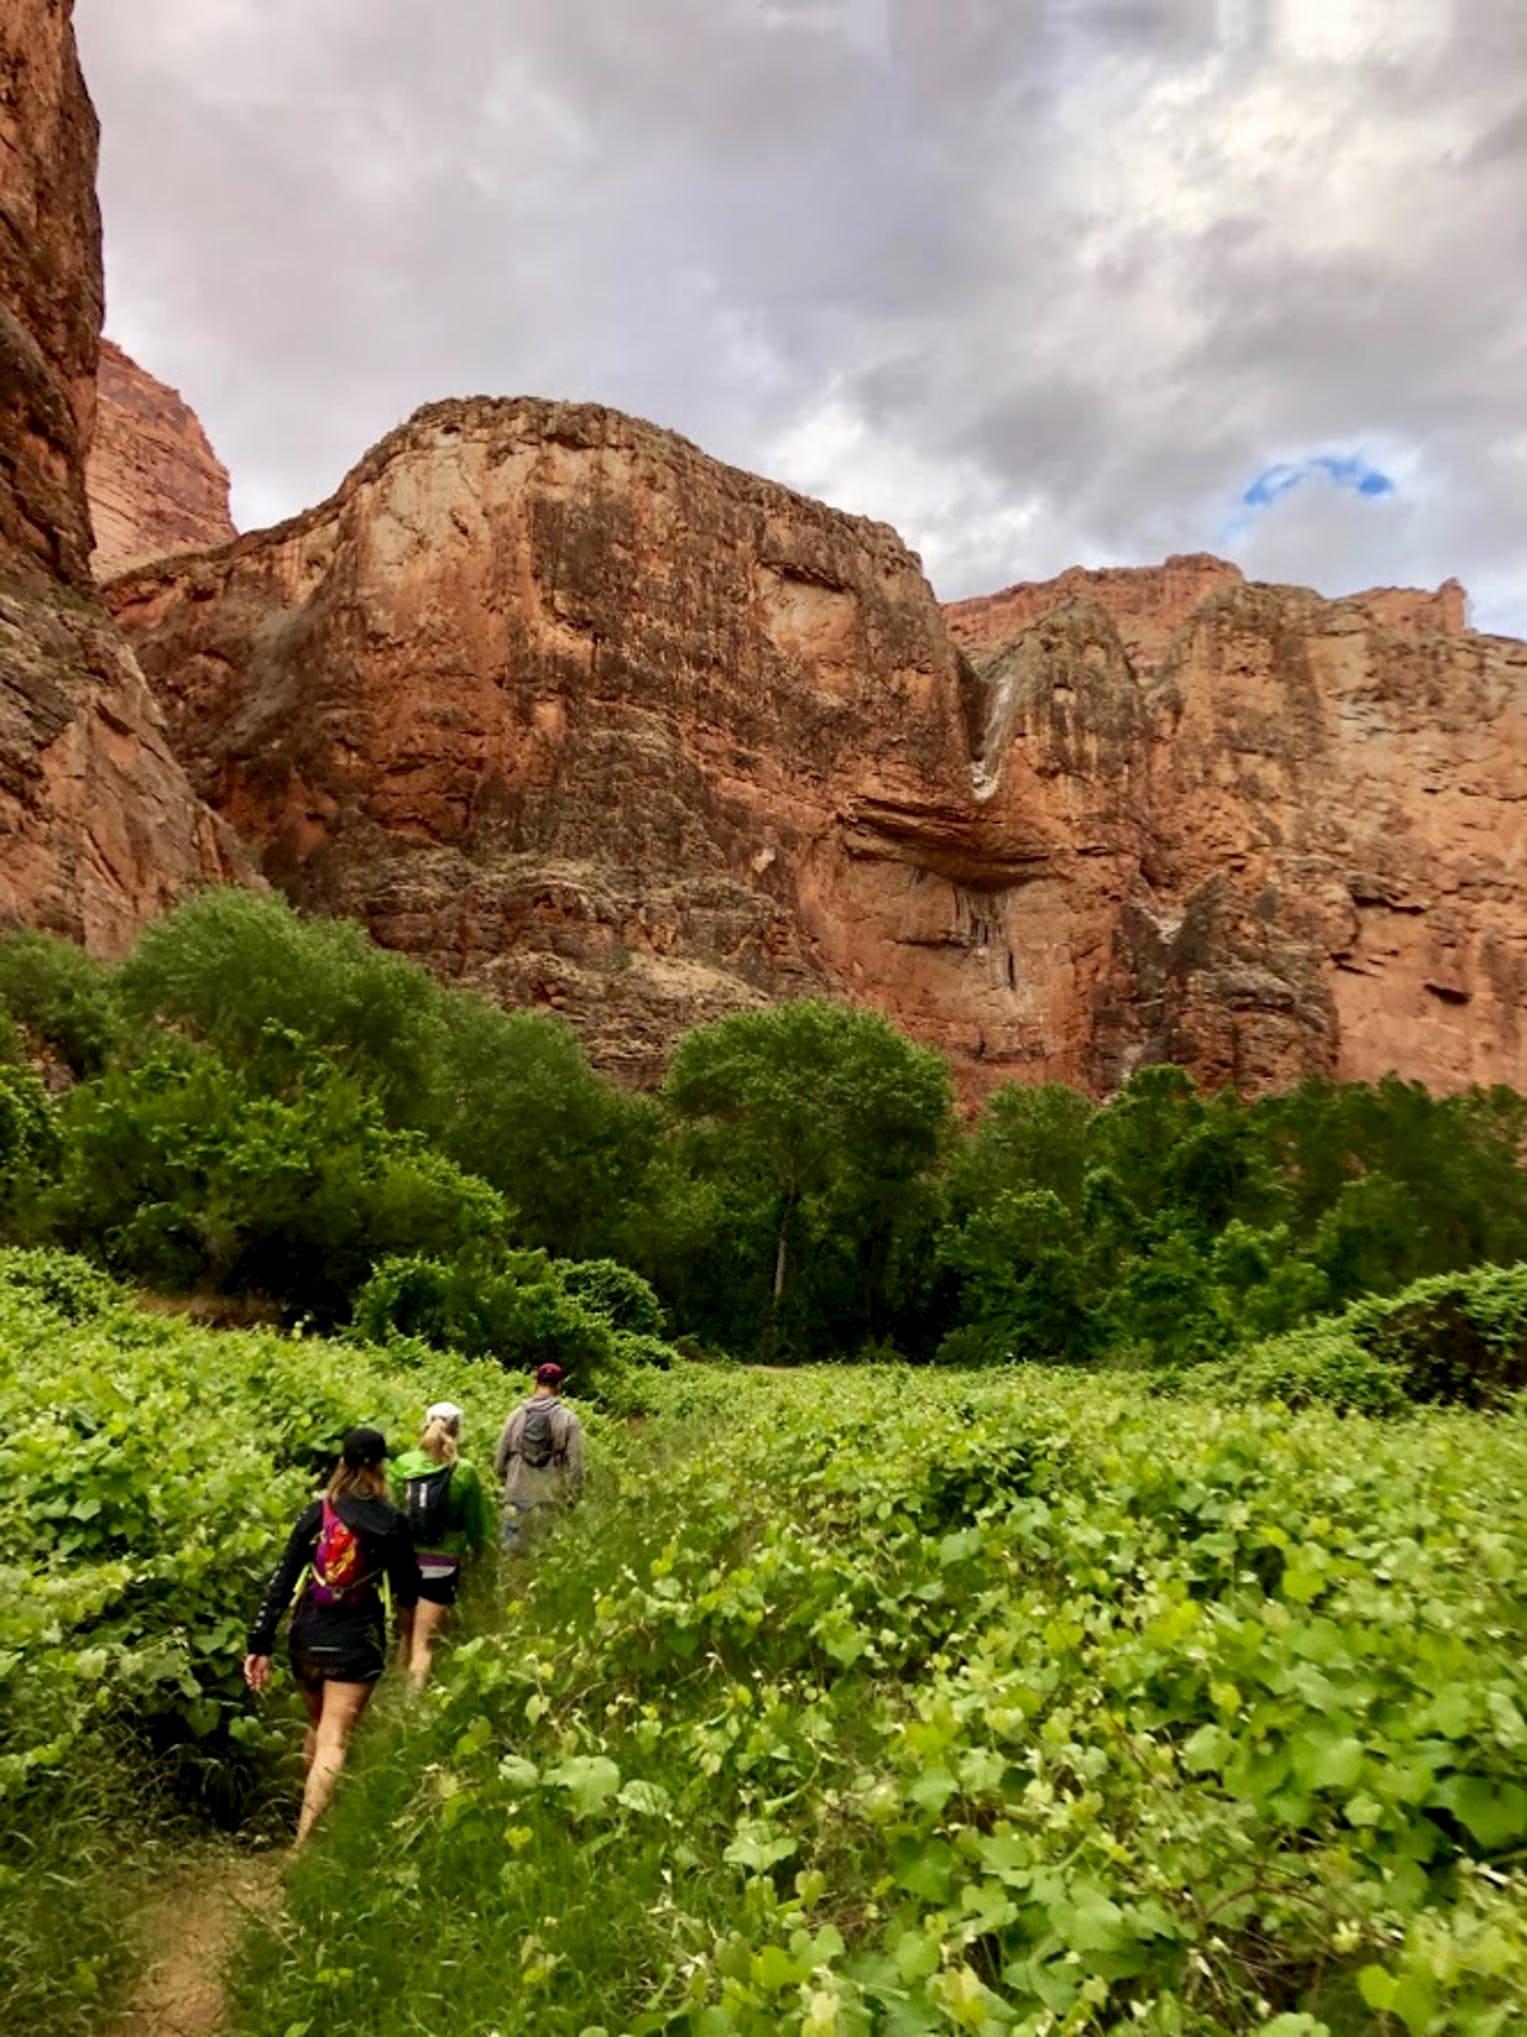 Day hikers walking through lush flora below a red rock canyon.